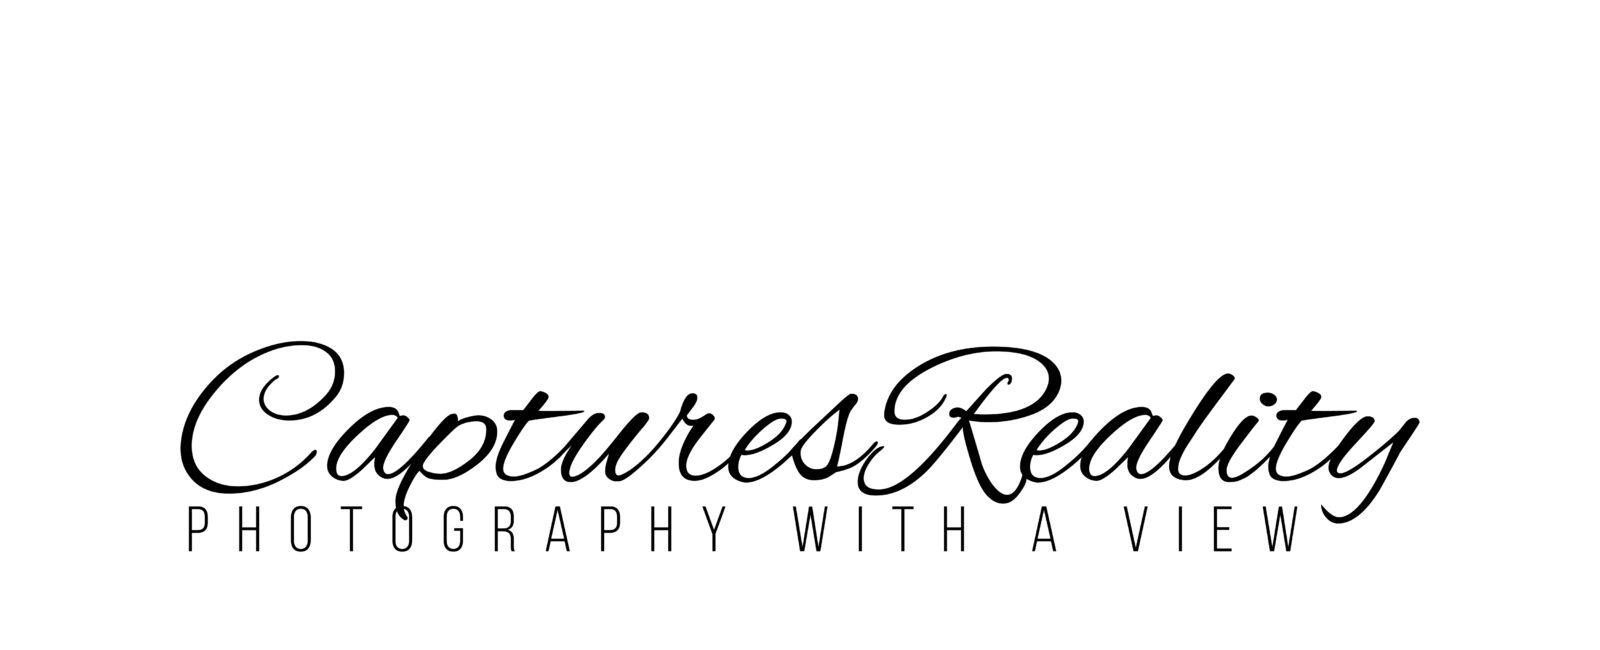 CapturesReality